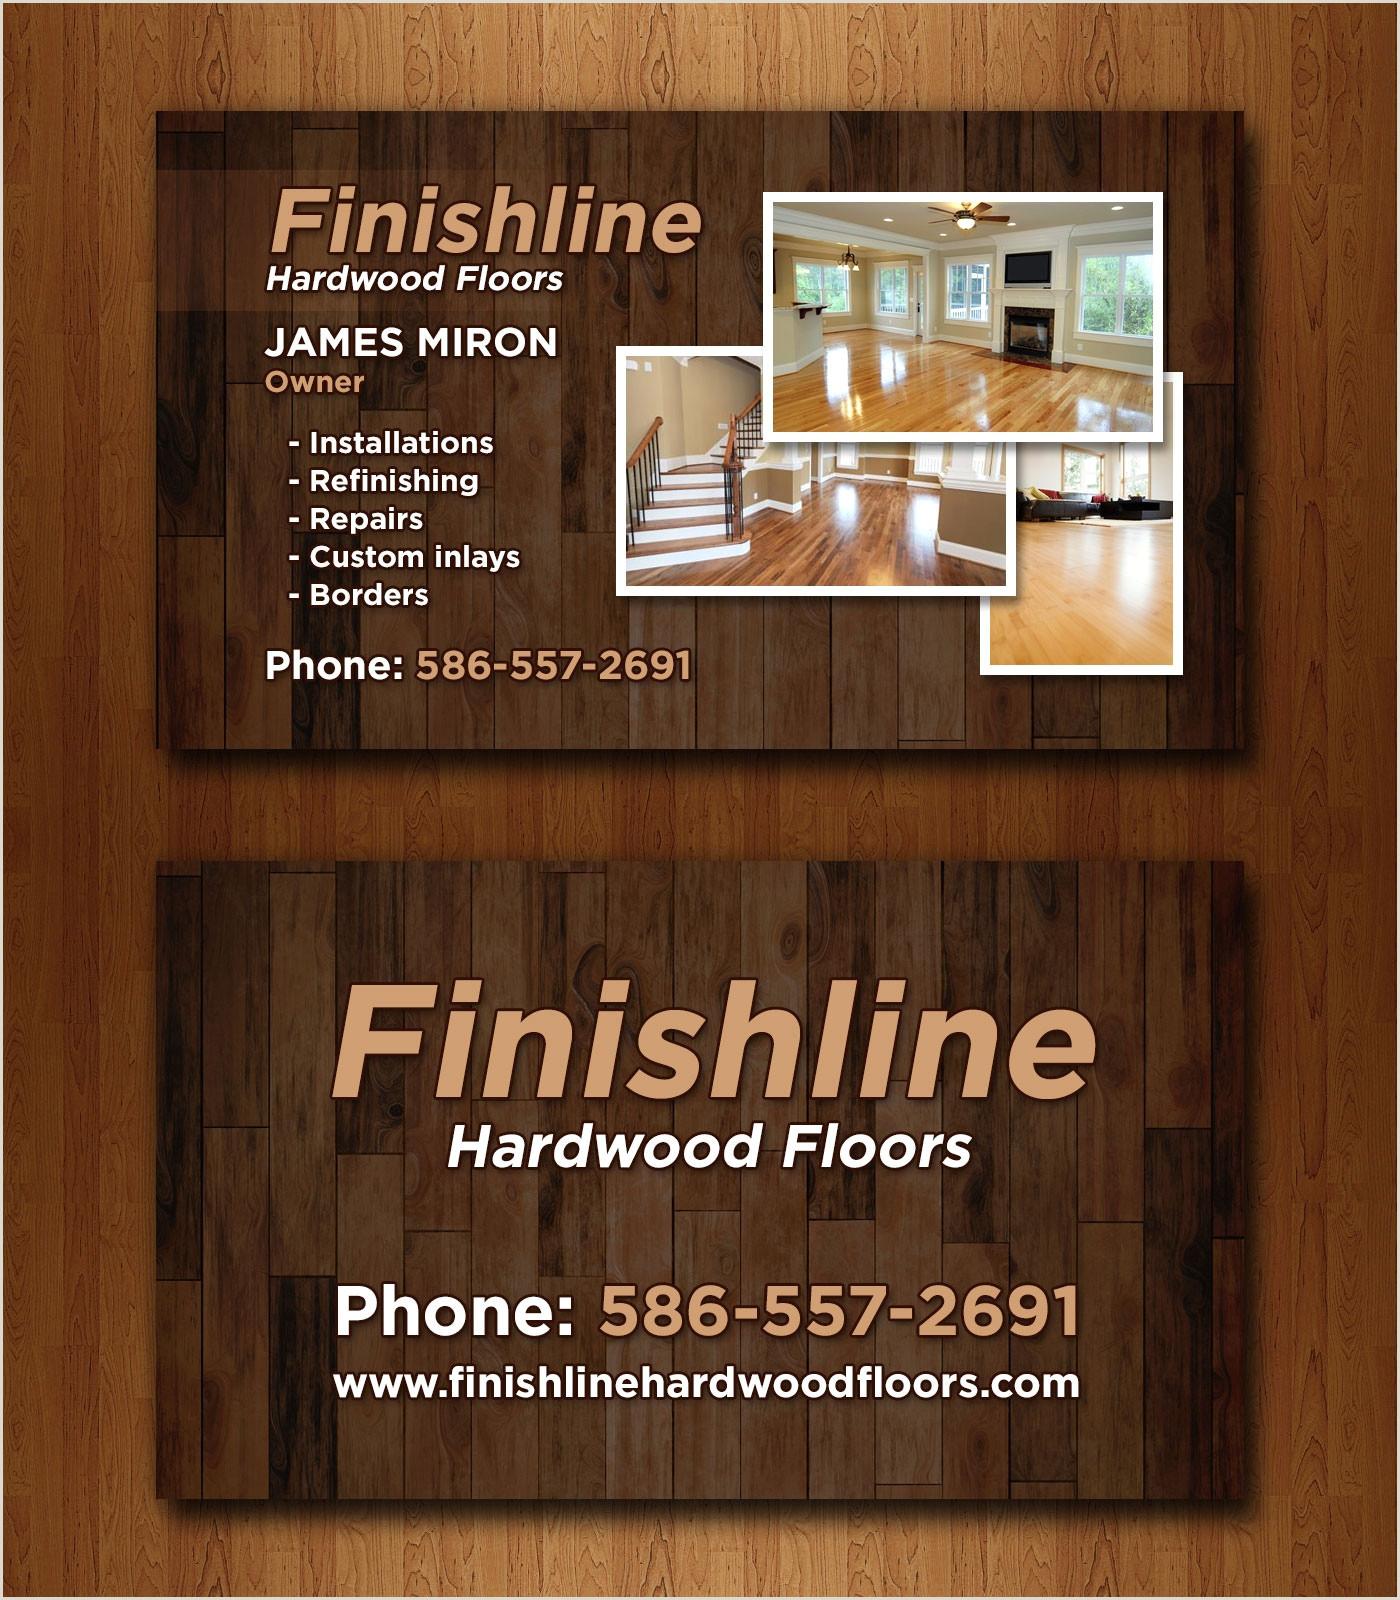 Calling Card Examples 14 Popular Hardwood Flooring Business Card Template